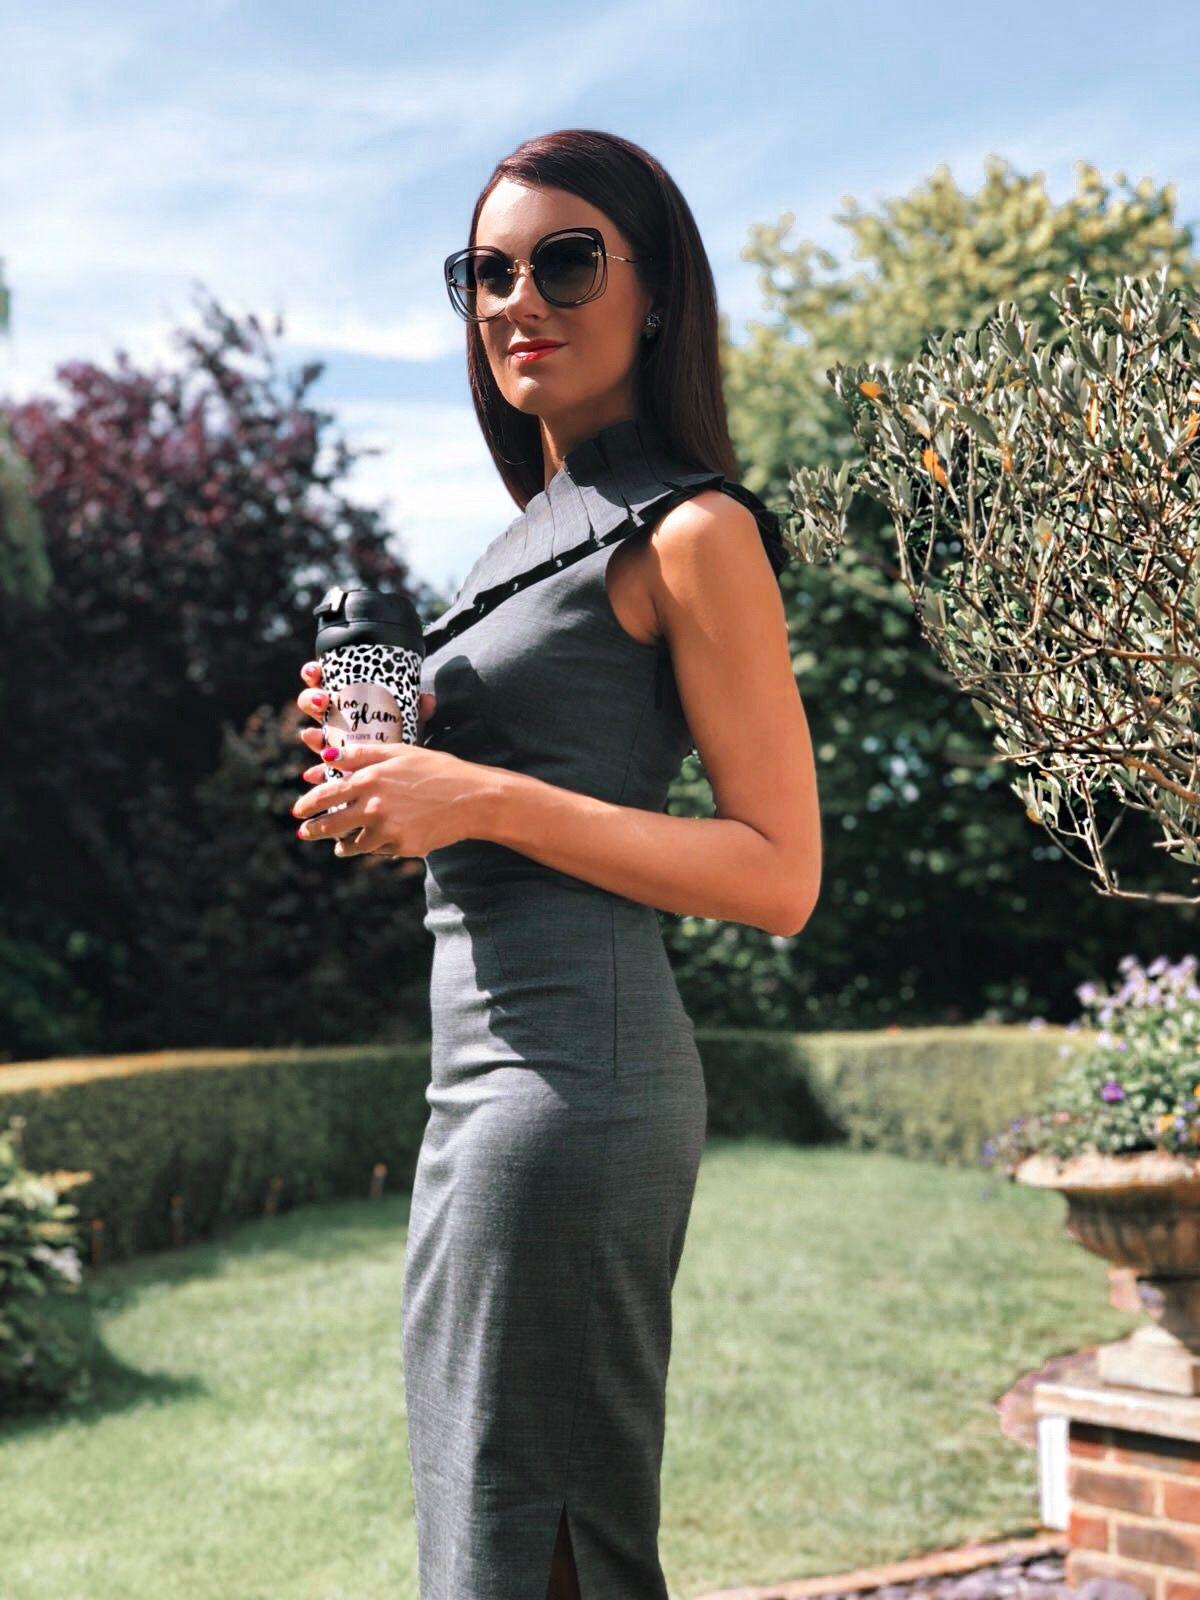 Ted Baker TREESAD Asymmetric ruffle detail dress | Ted Baker VYIXIN Pointed toe courts | Swarovski FANTASTIC PIERCED EARRINGS, GREY, RHODIUM PLATING | Miu Miu sunglasses